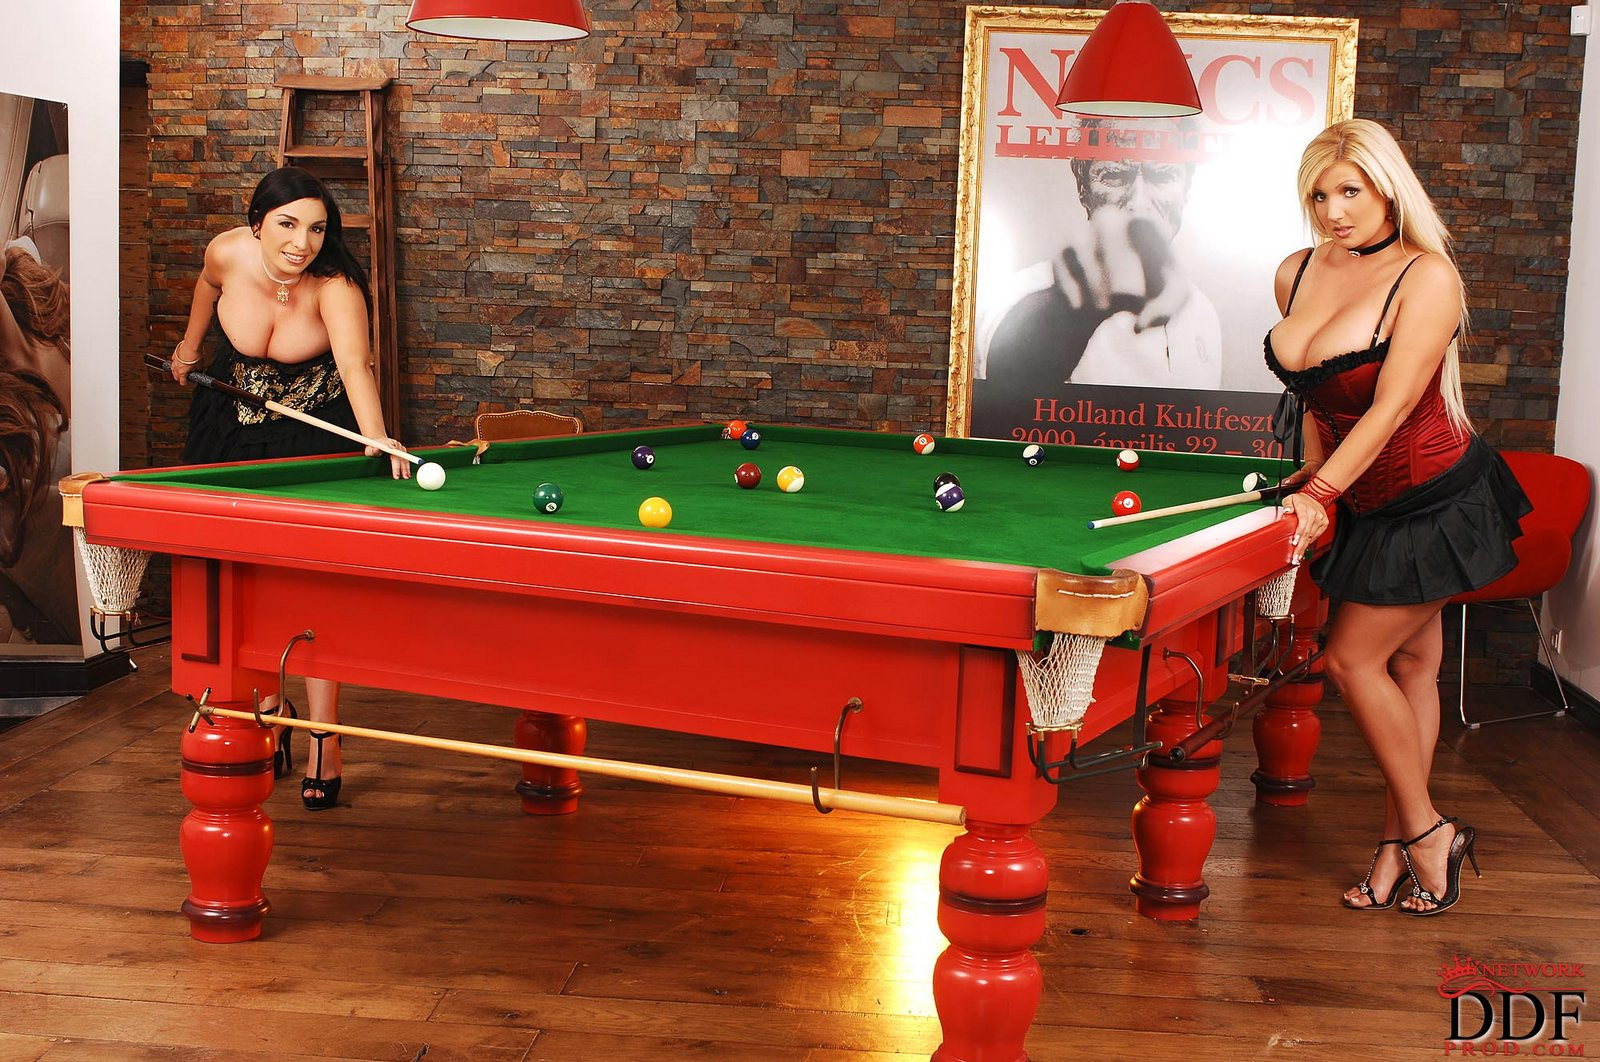 Hot sex on billiards table